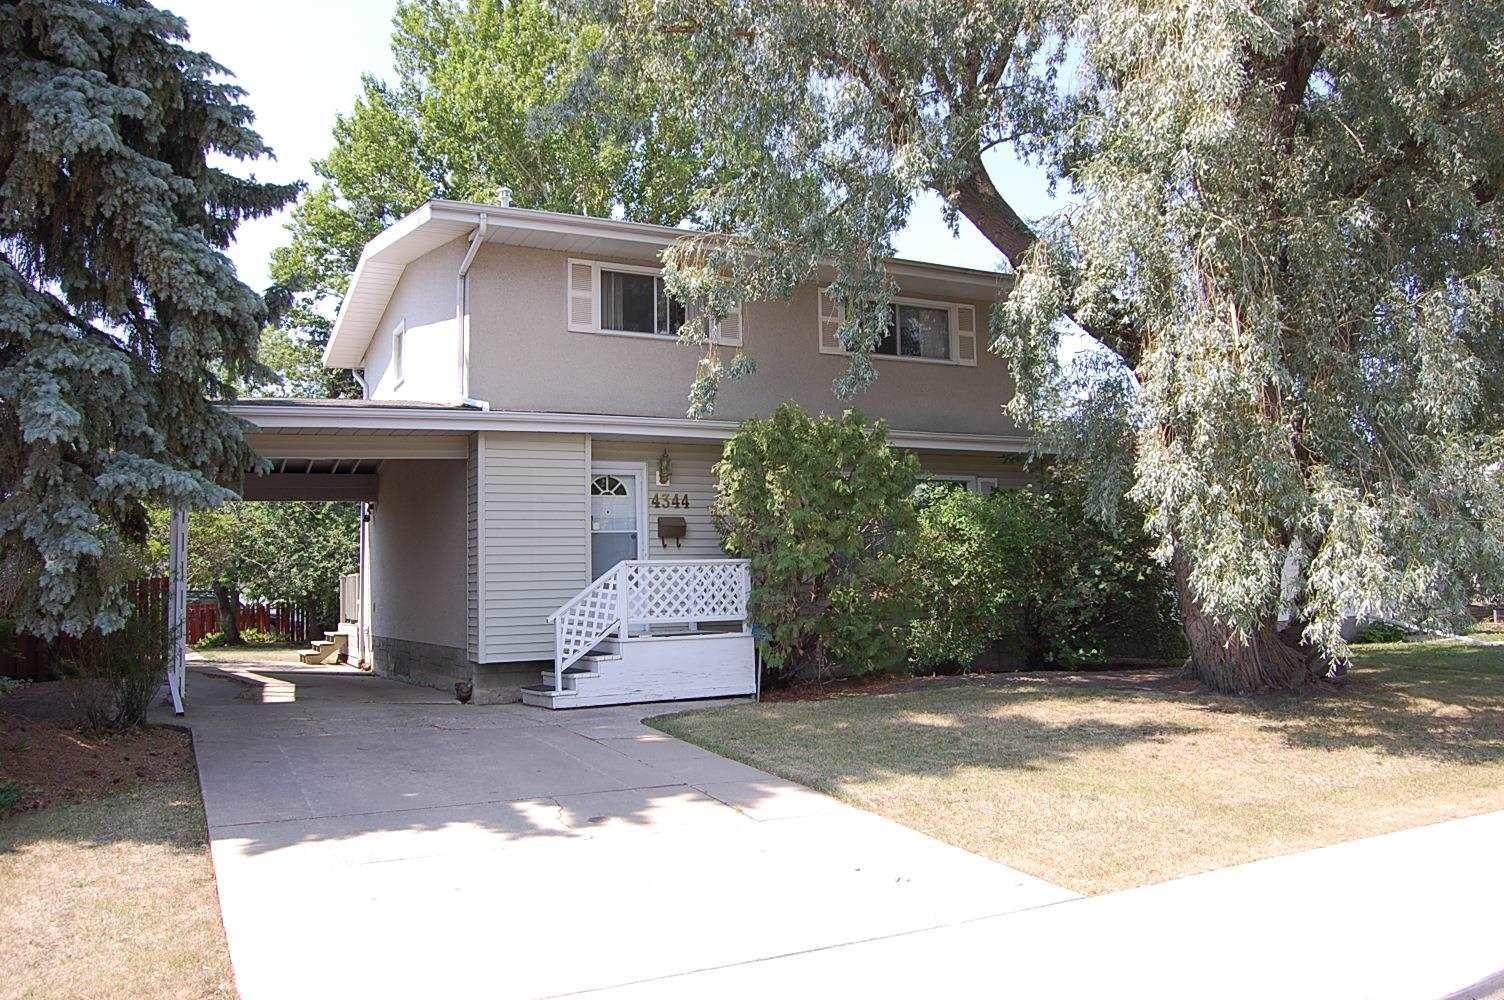 Main Photo: 4344 114 Street in Edmonton: Zone 16 House for sale : MLS®# E4252716